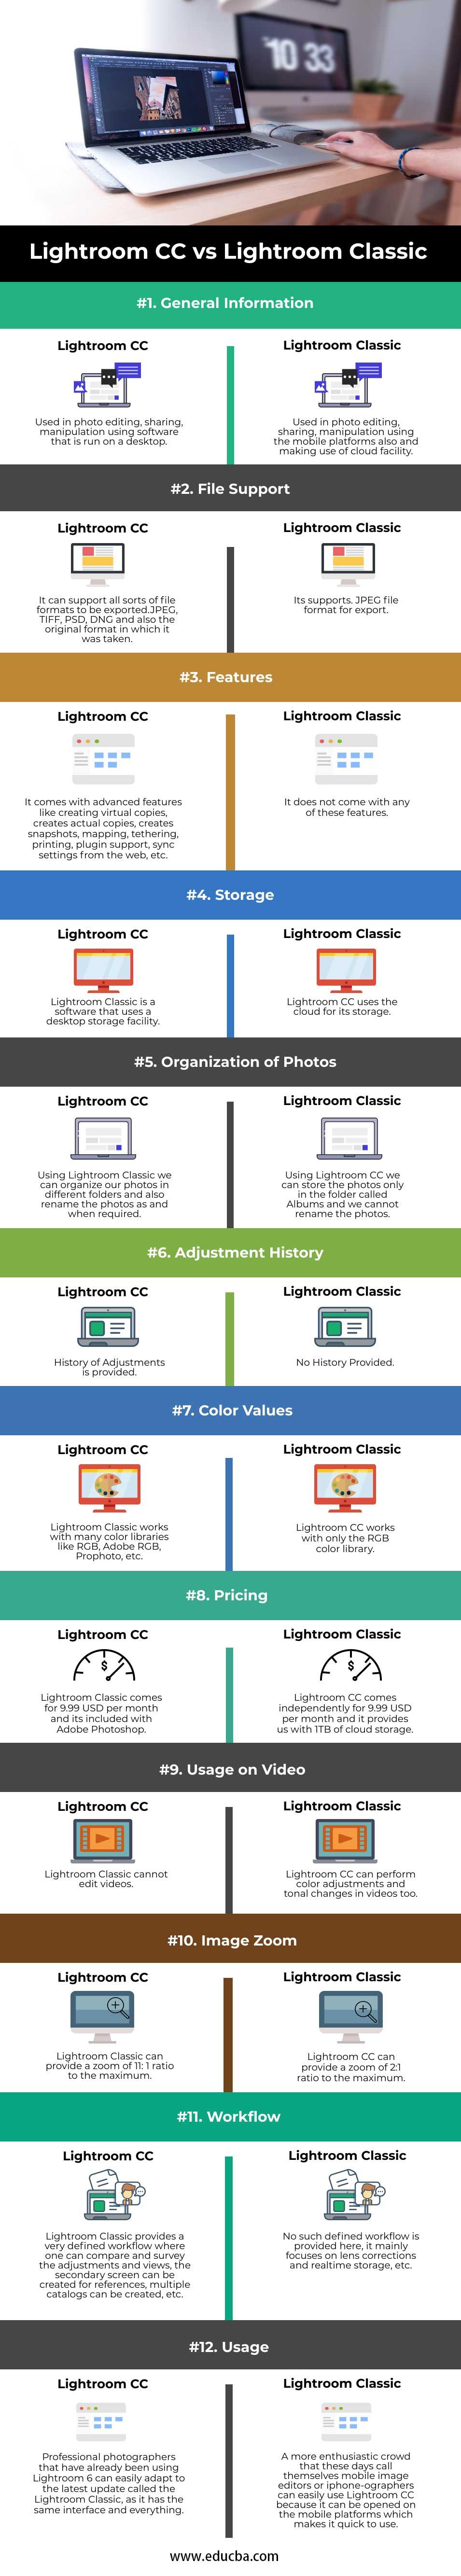 Lightroom-CC-vs-Lightroom-Classic-info